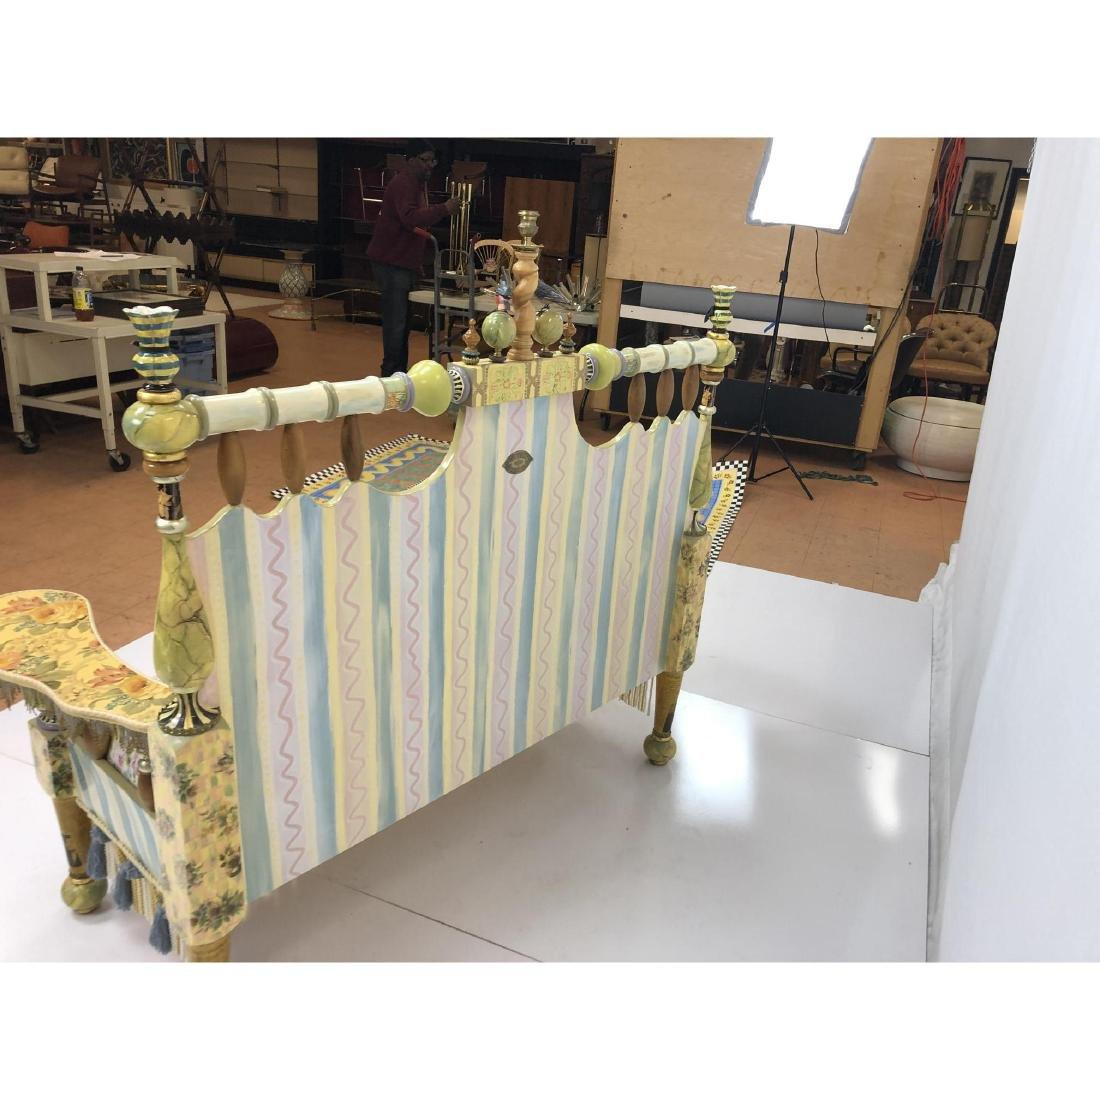 MACKENZIE CHILDS Handmade Painted Settee Couch. E - 5